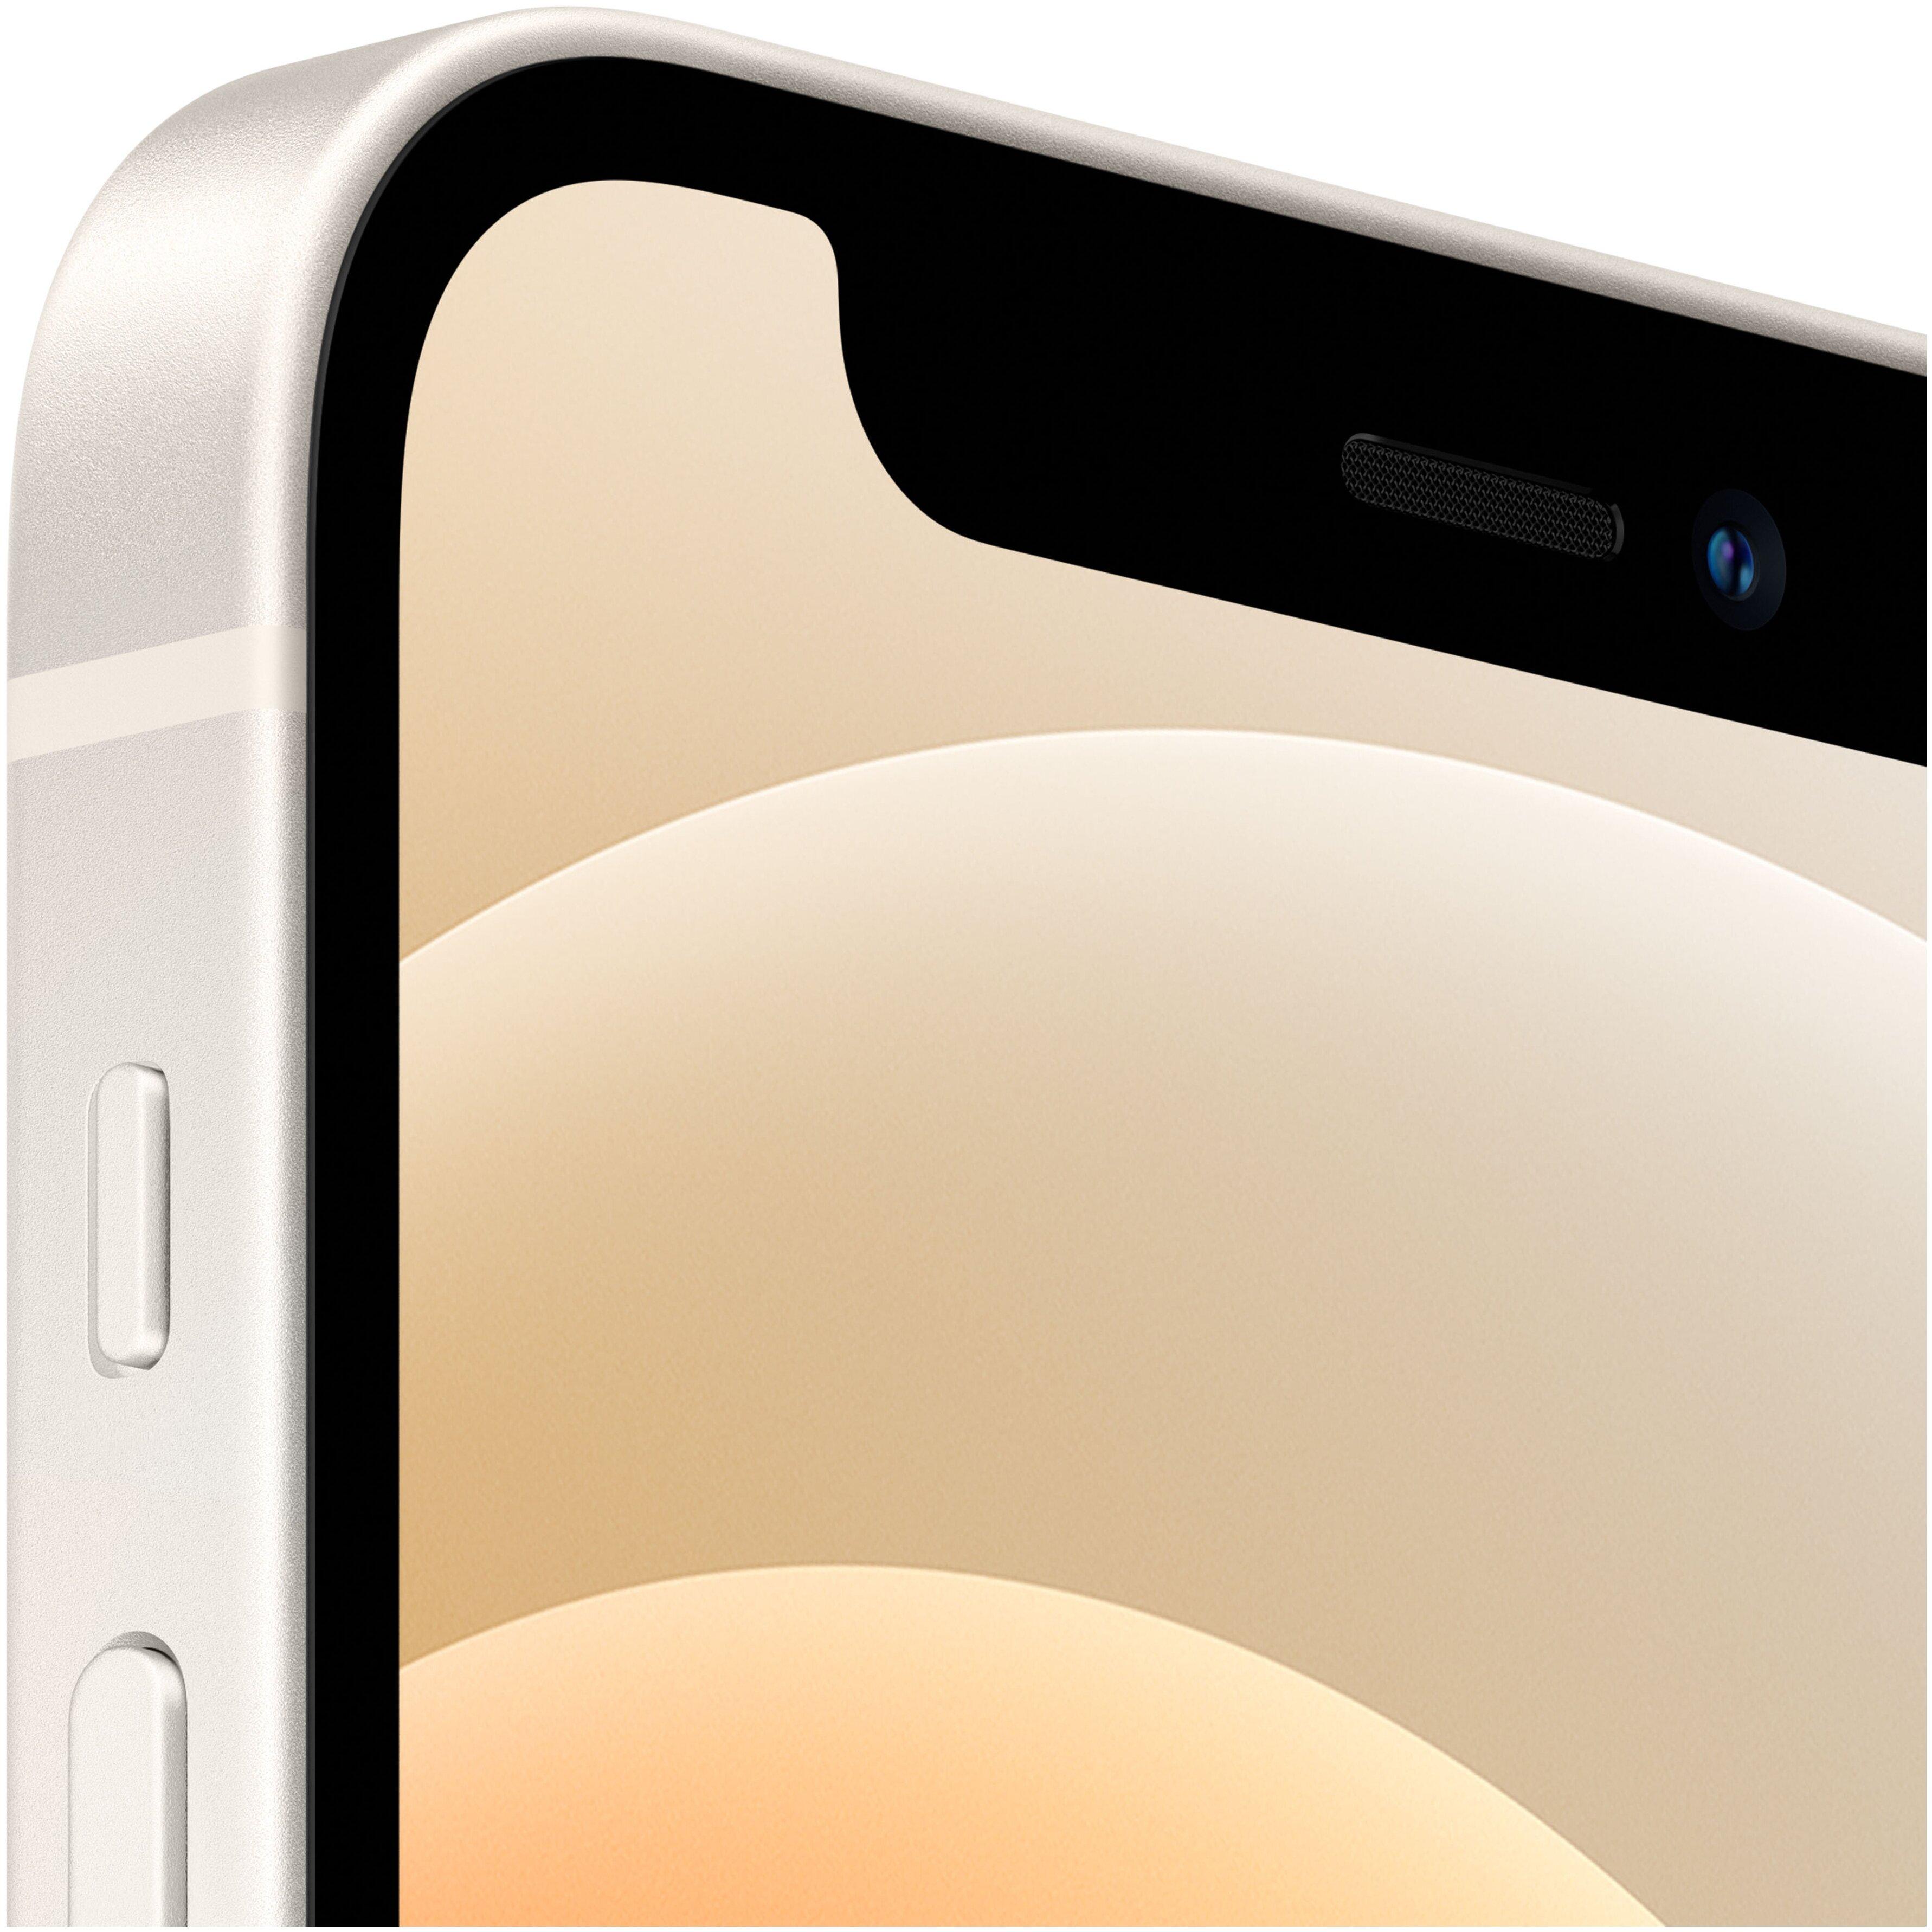 Apple iPhone 12 mini 64GB - аккумулятор: 2227мА·ч